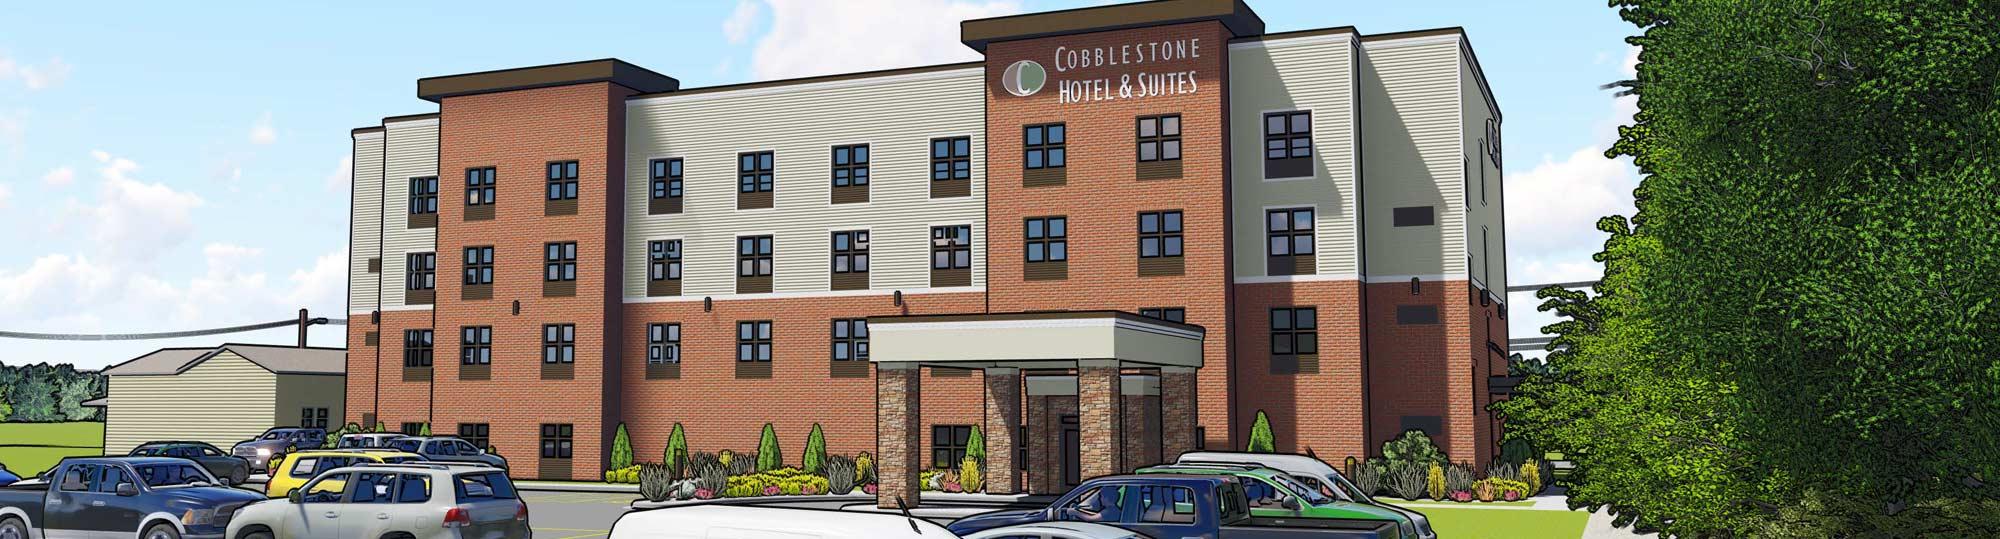 Cobblestone Hotel and Suites Hartford